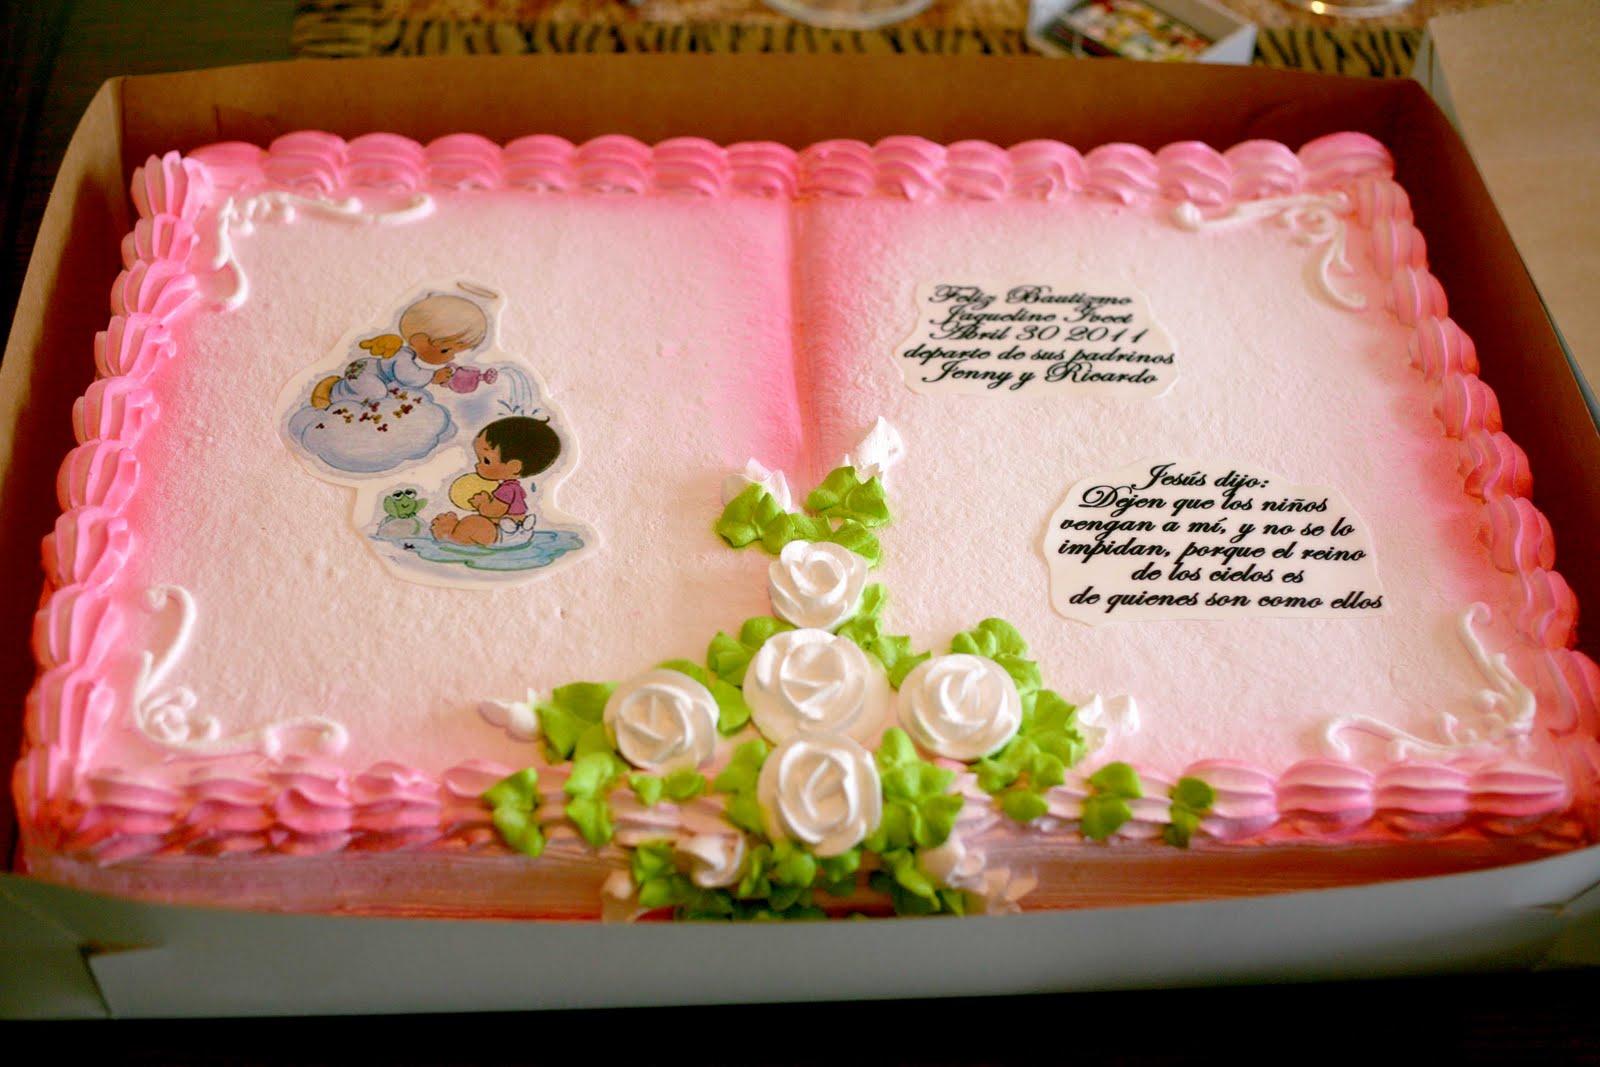 Hector S Custom Cakes June 2011